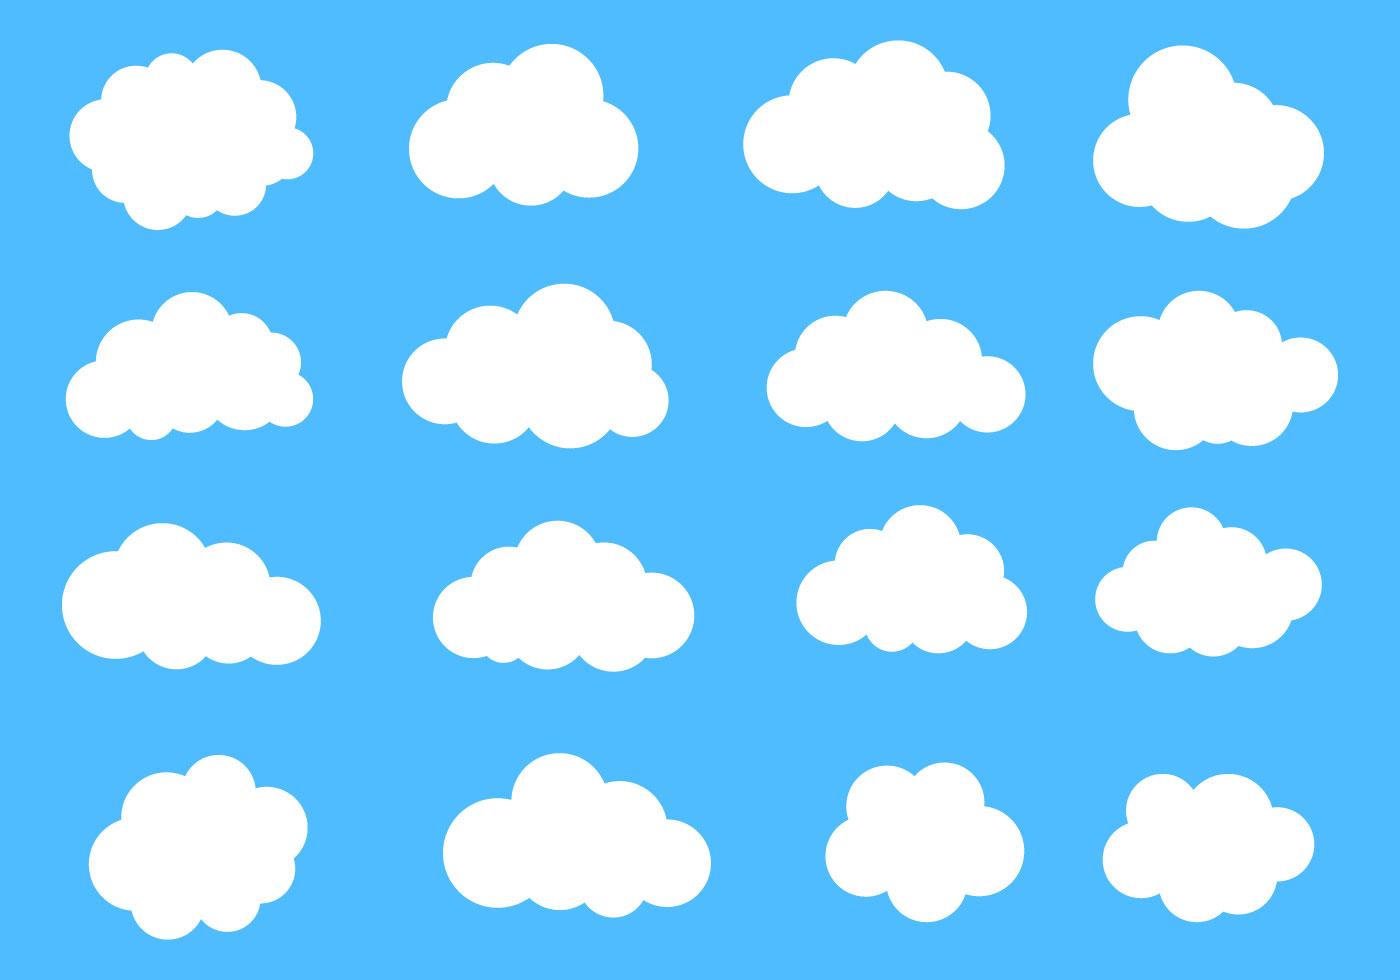 Cloud Free Vector Art